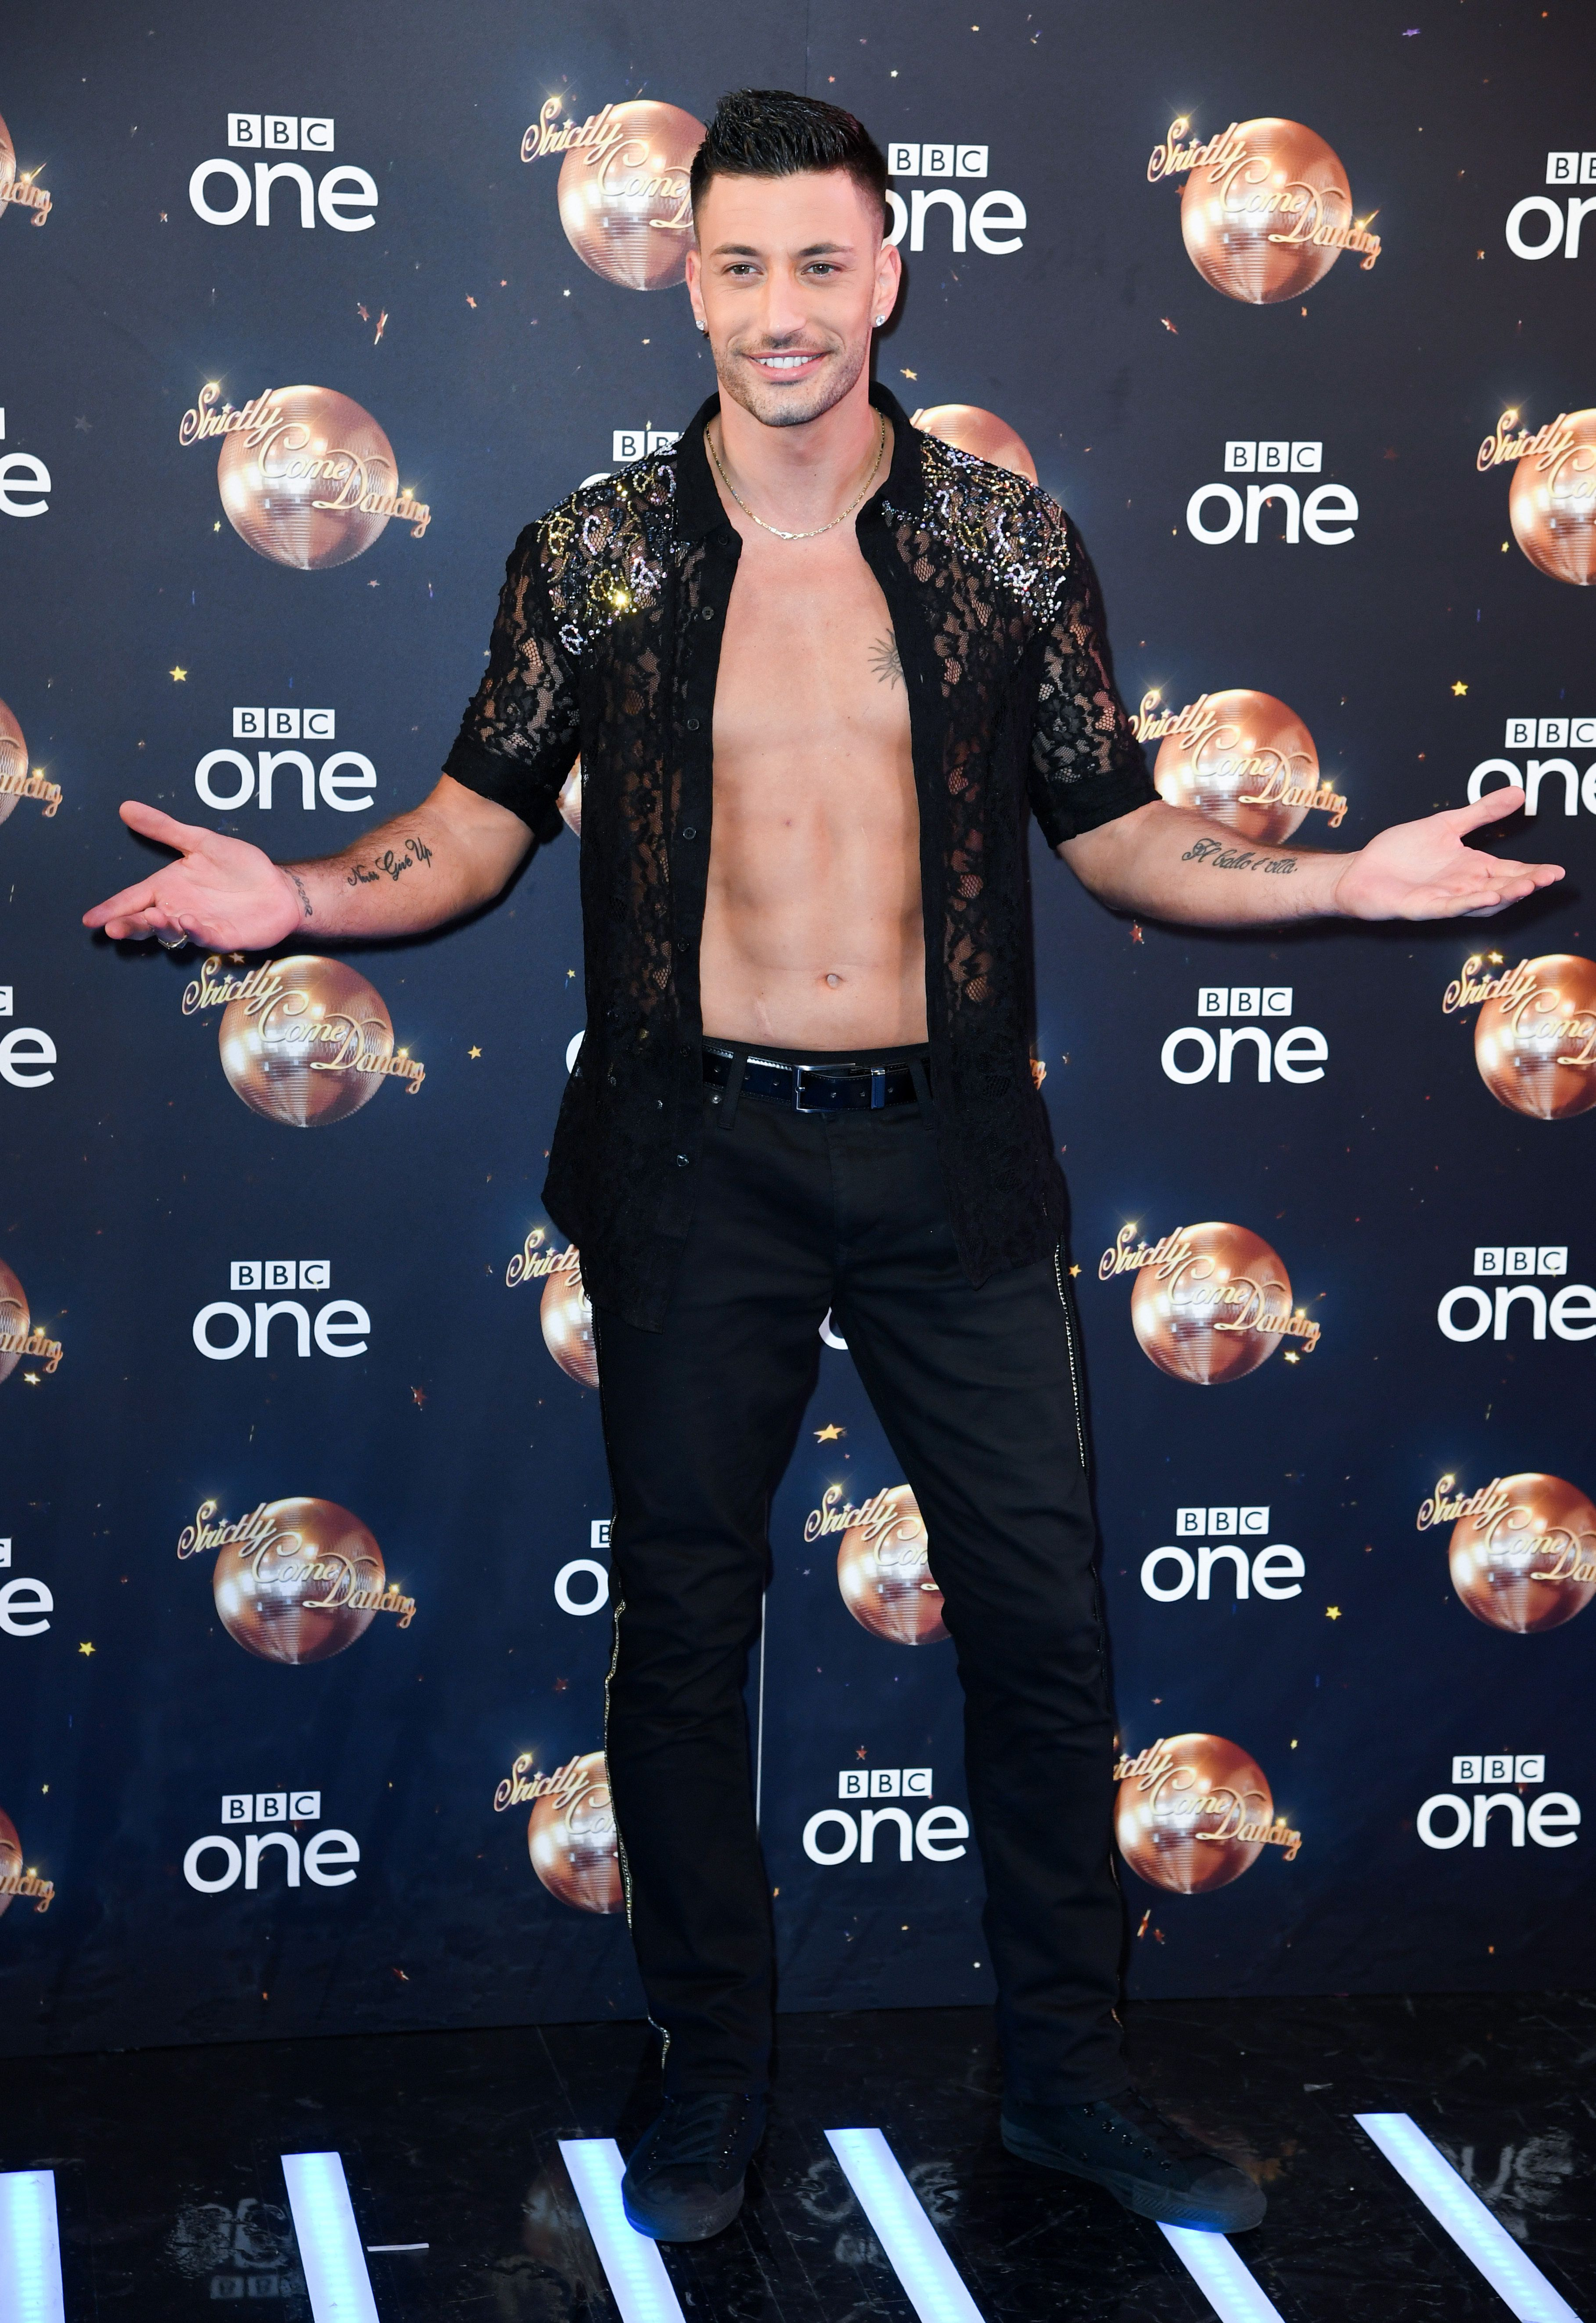 Strictly Come Dancing's Giovanni Pernice Hits Back At Gleb Savchenko Over 'Nonsense' Romance